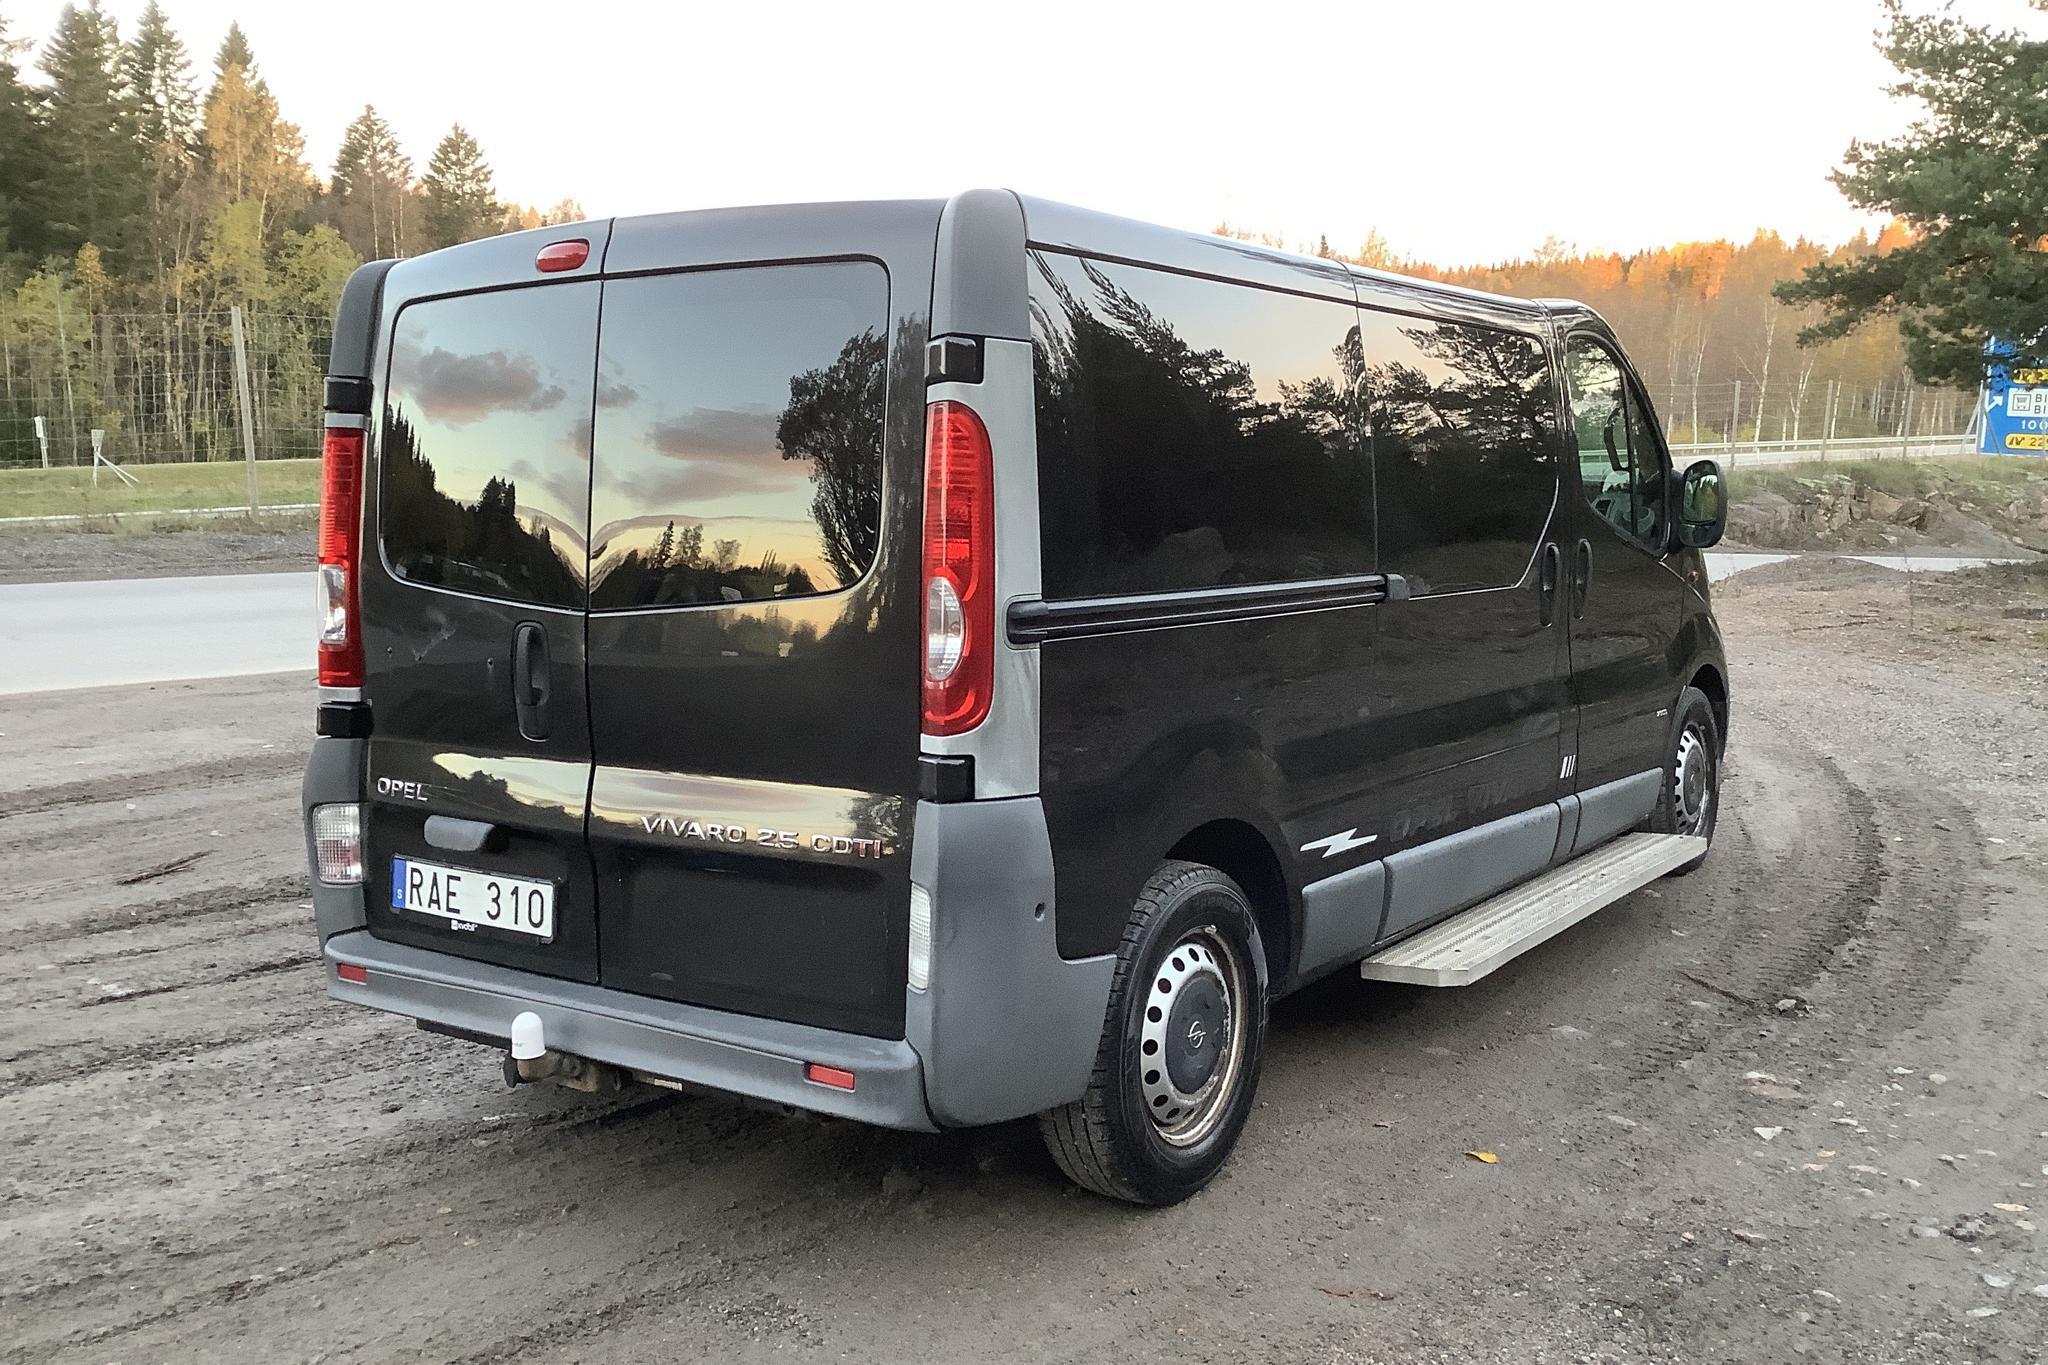 Opel Vivaro 2.5 DTI (146hk) - 293 020 km - Manual - black - 2008